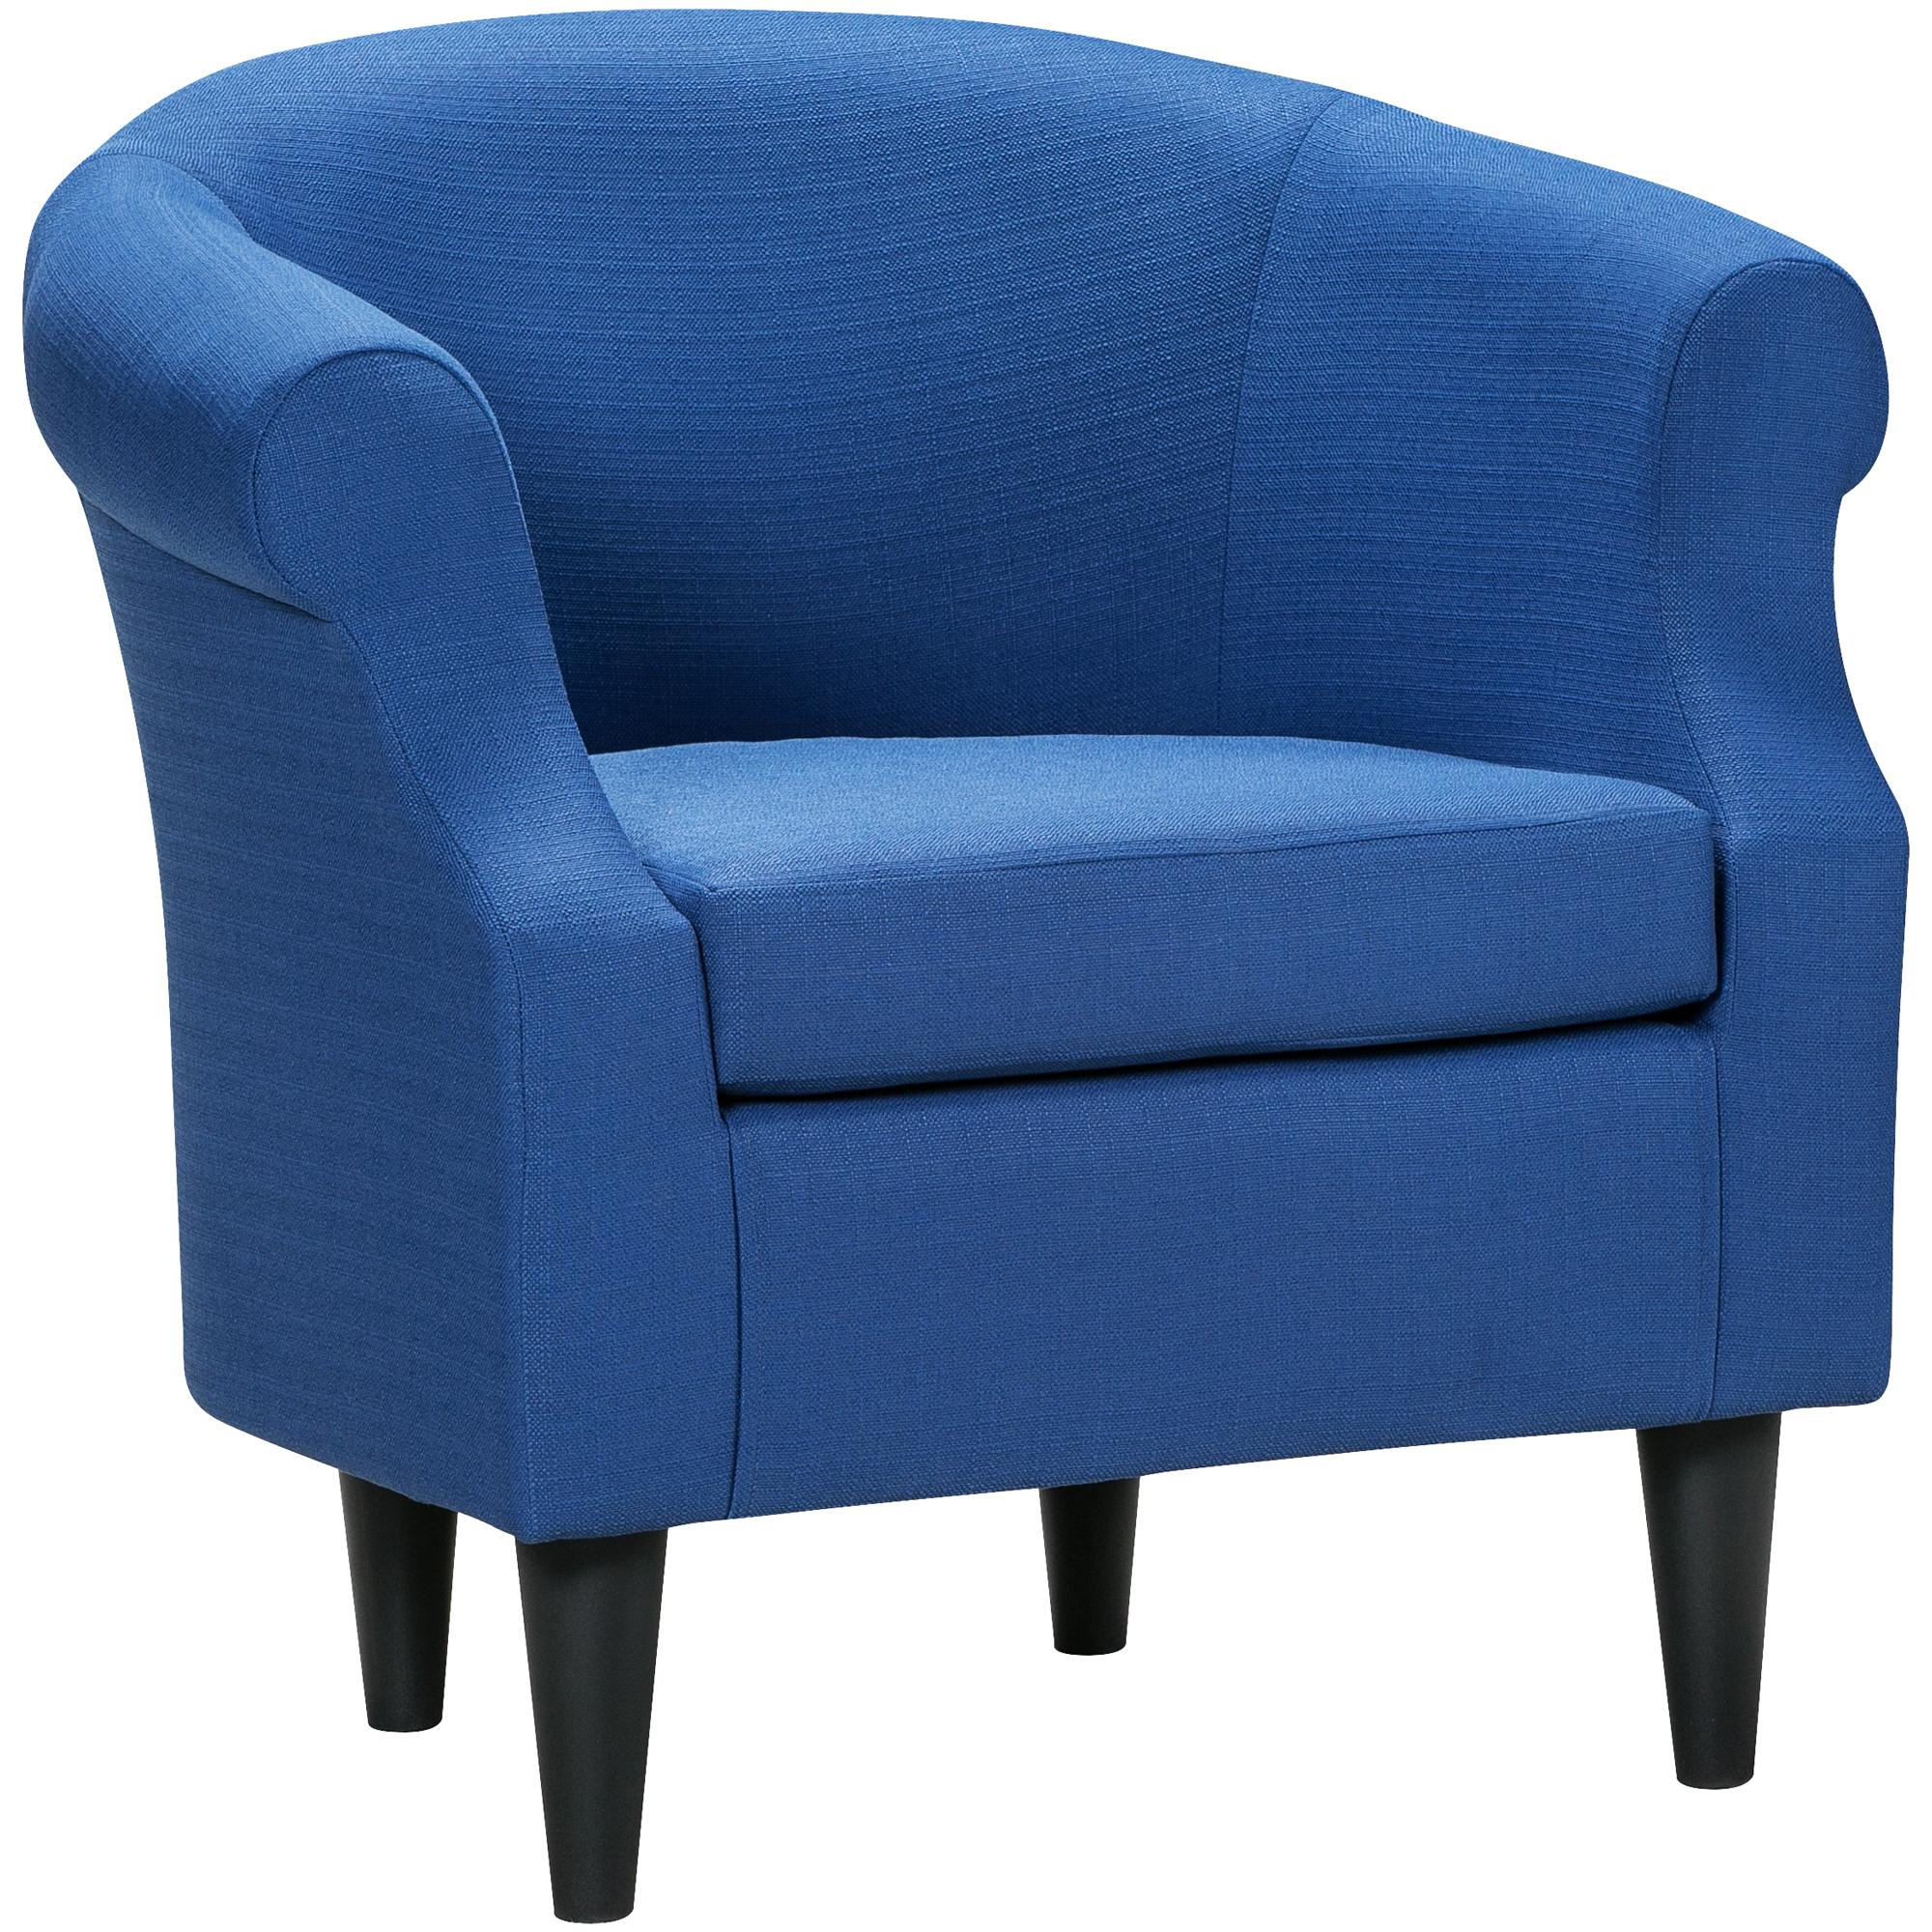 Overman | Nikole Marine Accent Chair